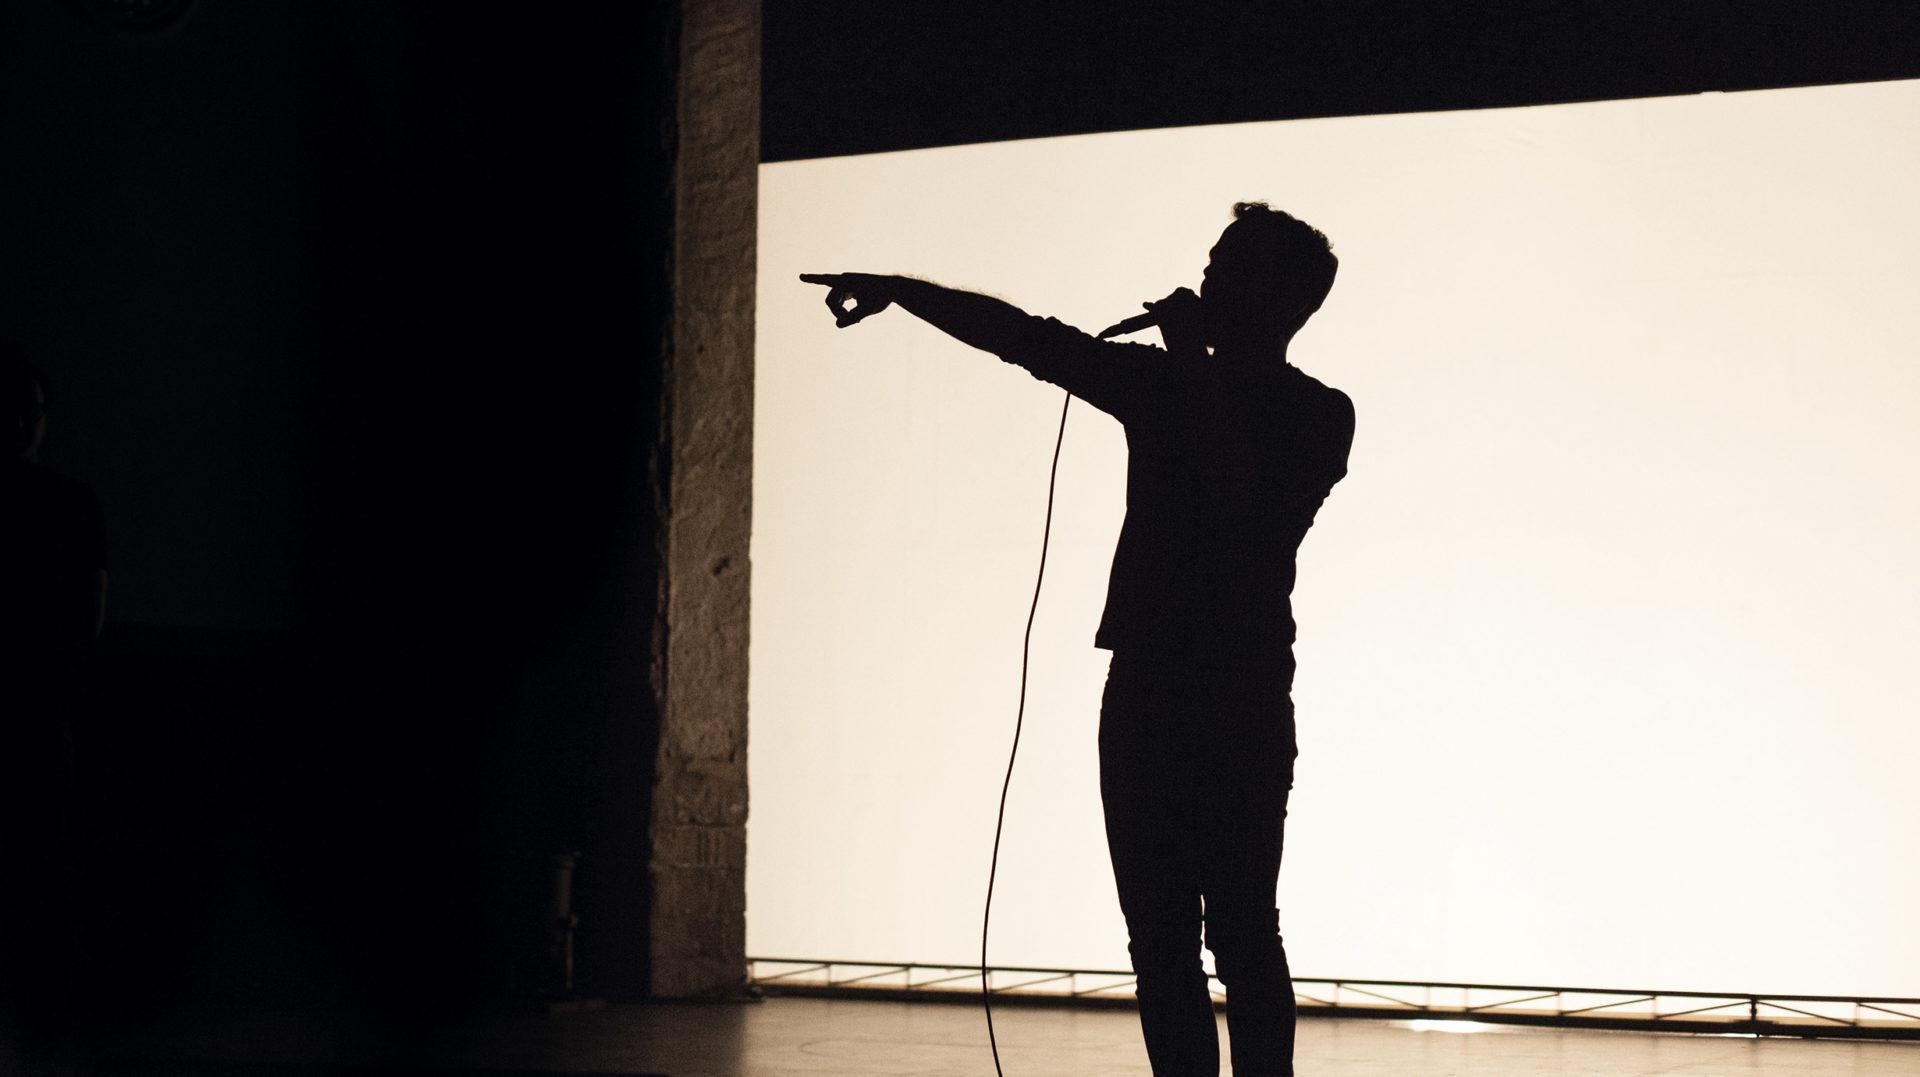 Non muttum: poesia sonora en escena